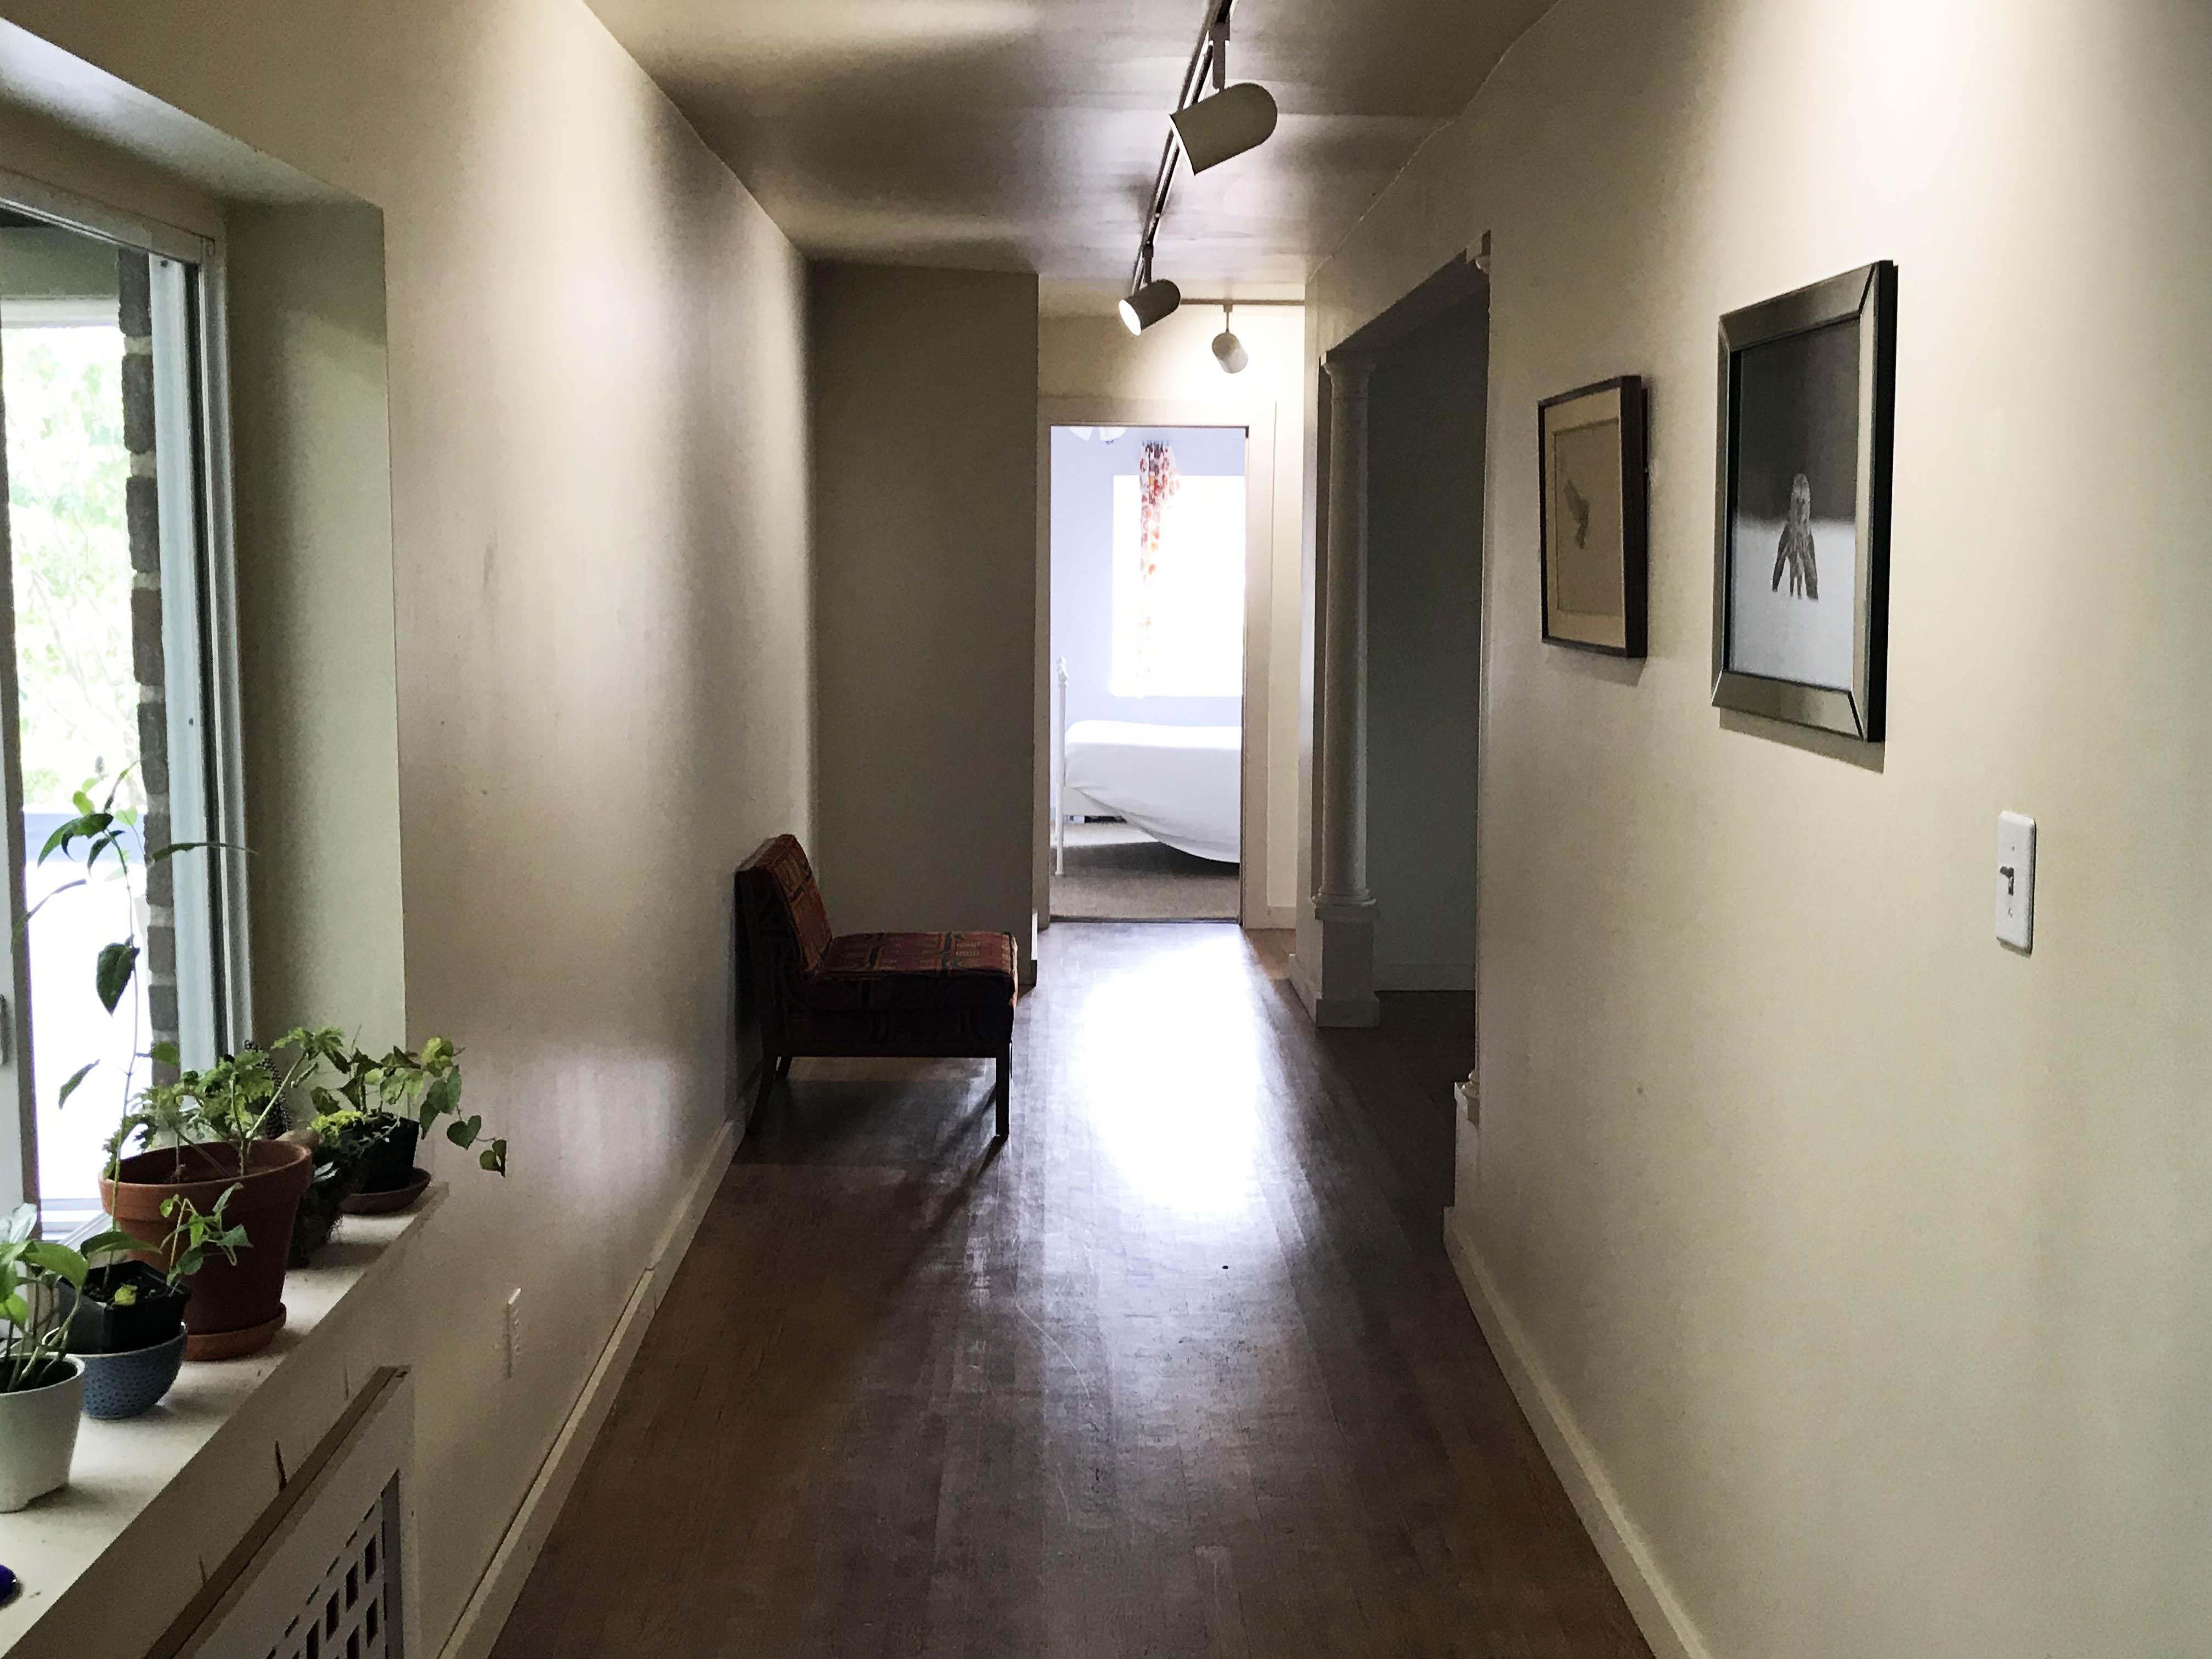 West Wing Hallway